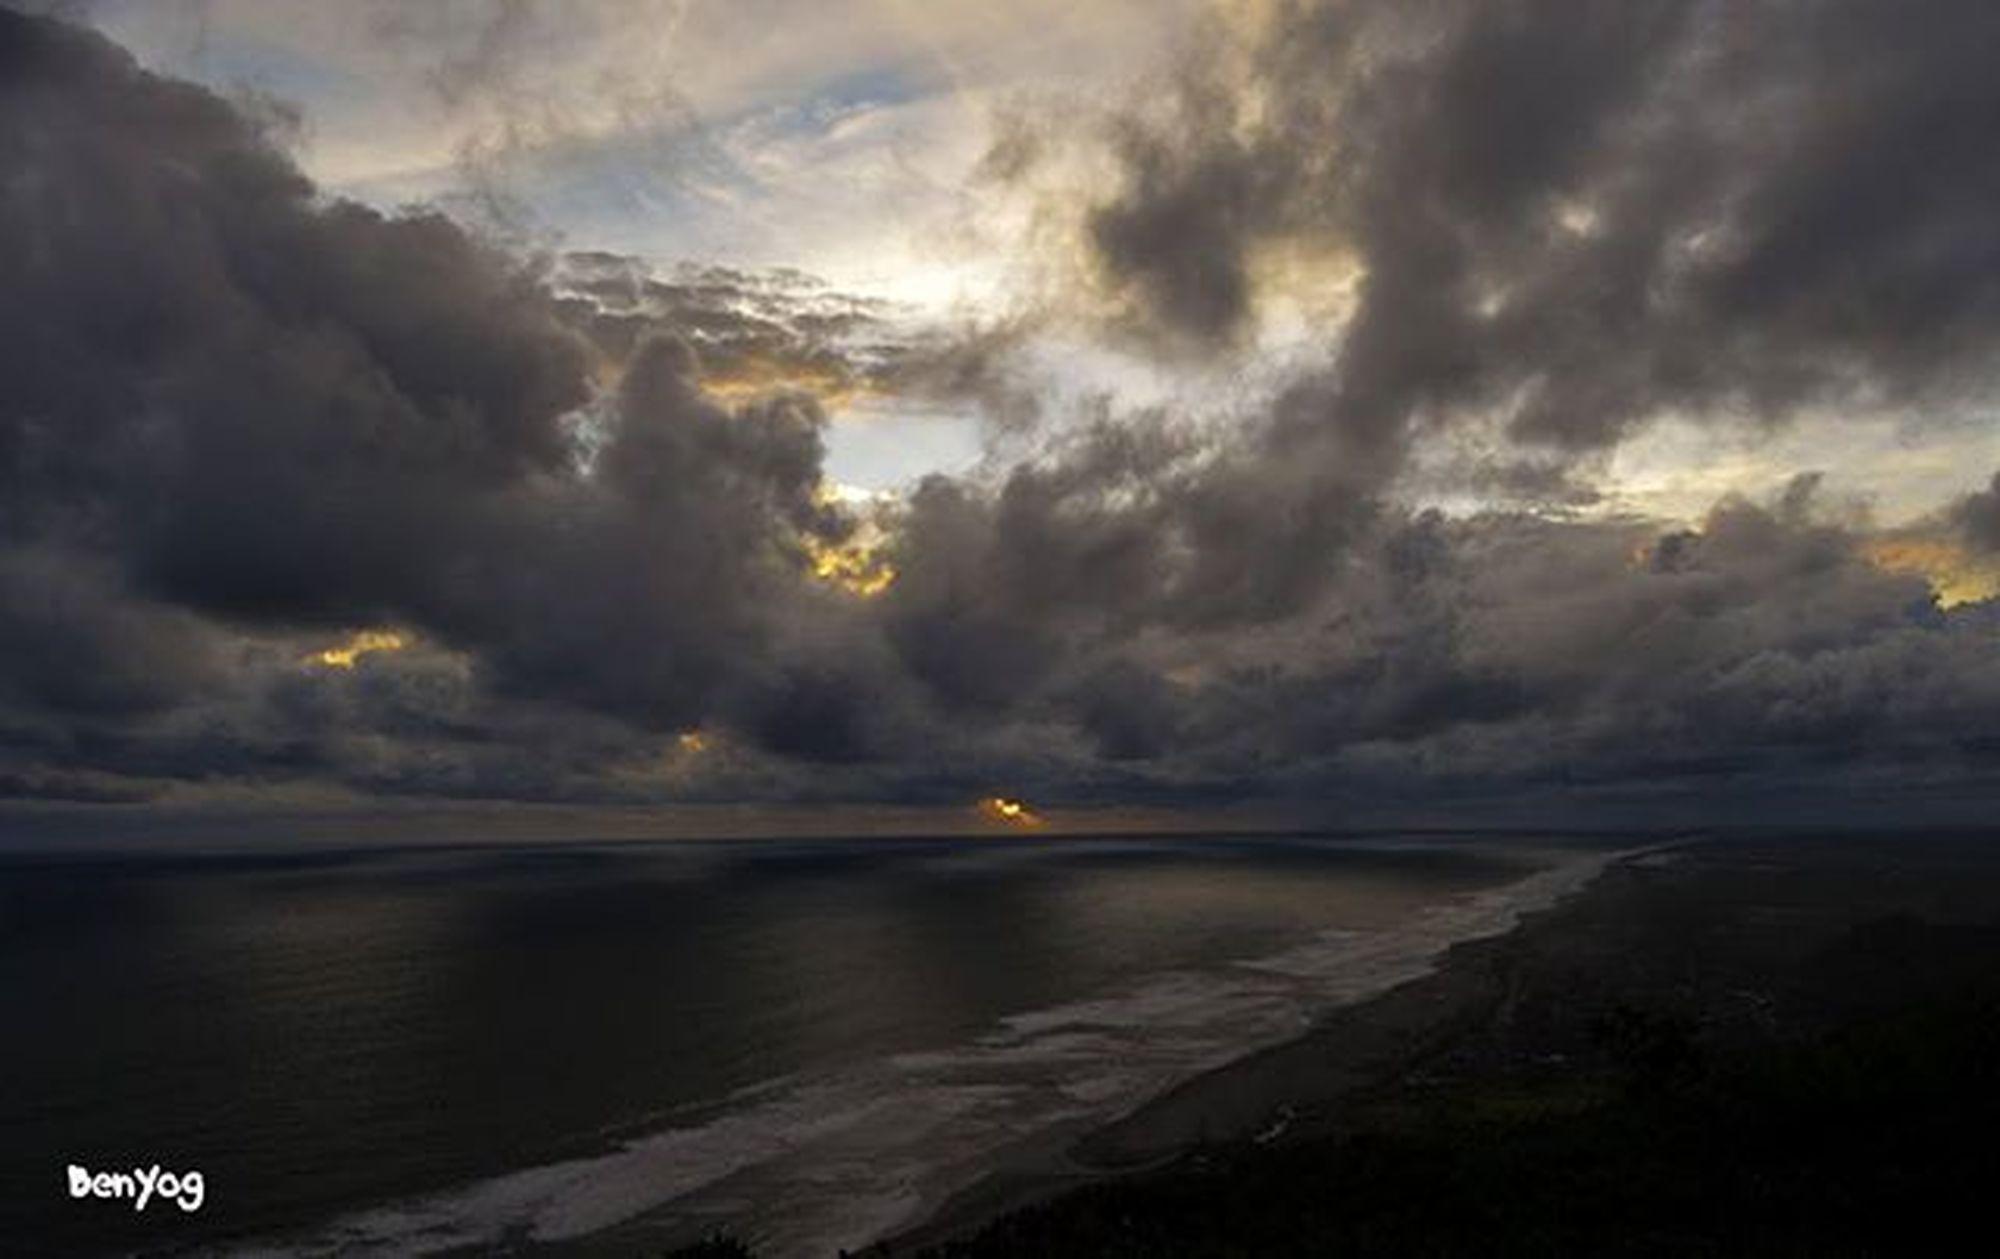 Sunset ketutup mendung, bukit paralayang bantul melu yok @marlinbrekele @rizaramadhana @inekeniike Geblekchallenge02 Geblekkp